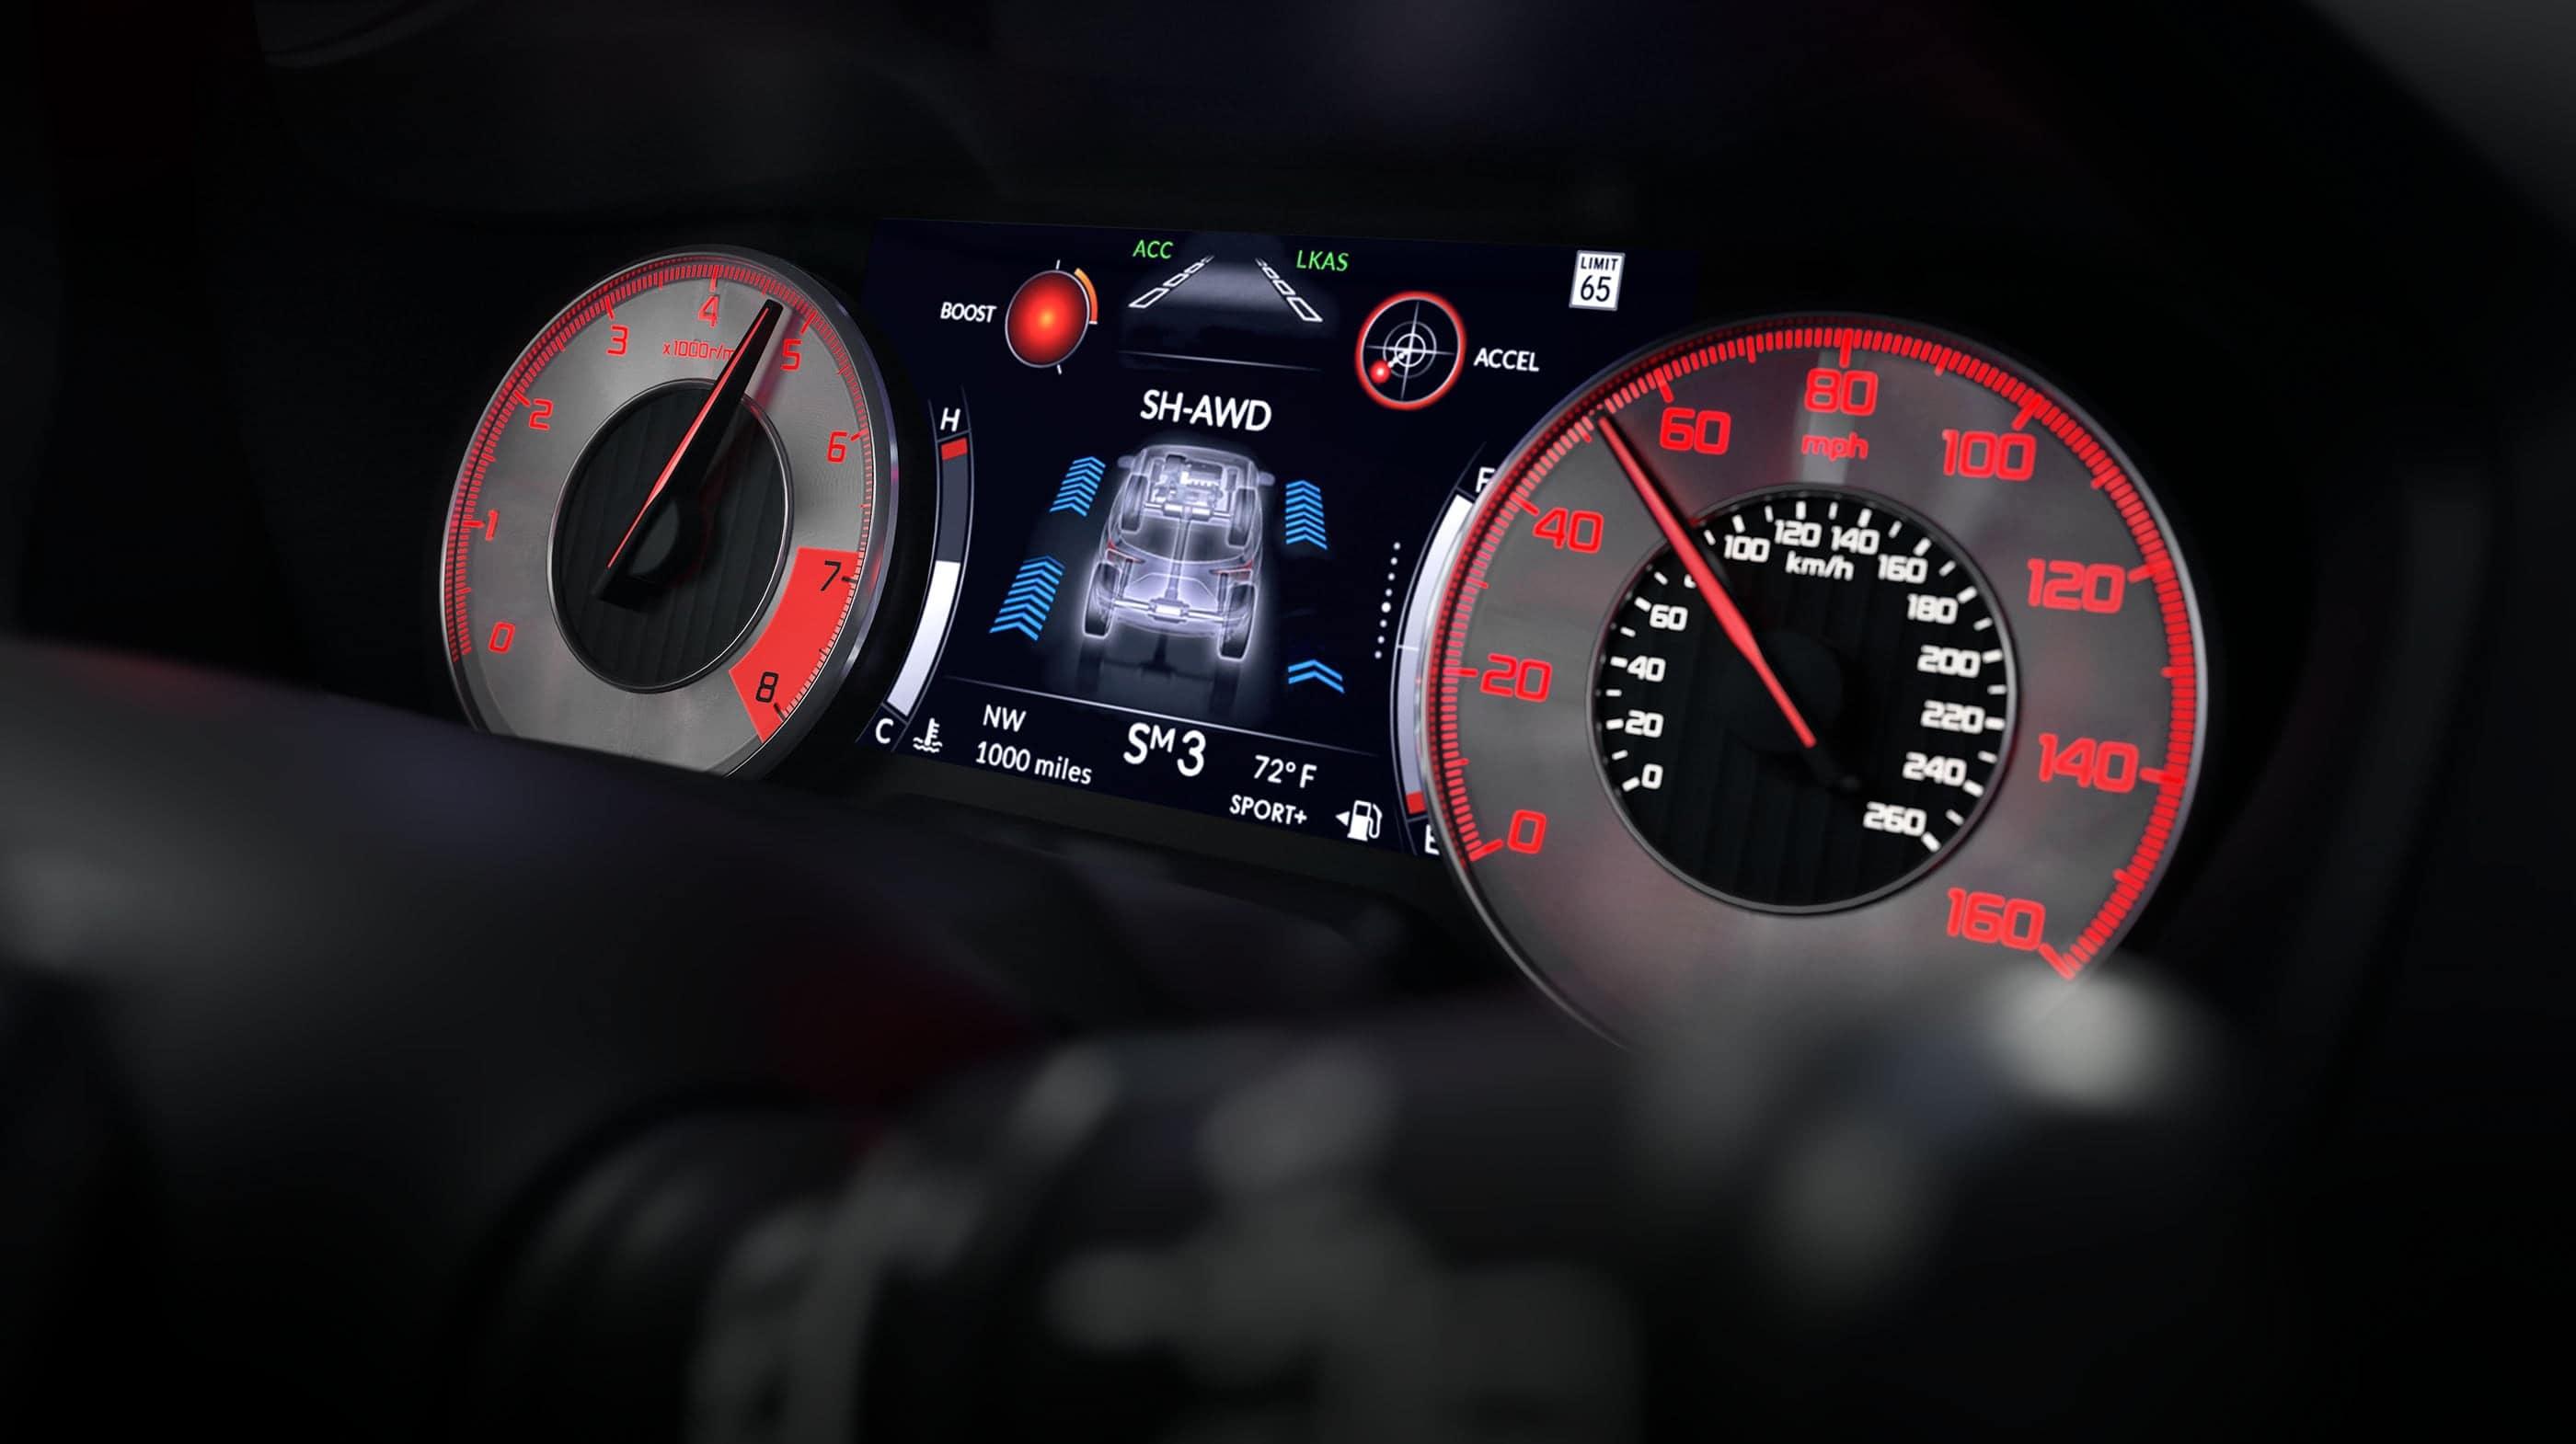 2020 Acura RDX Information Display